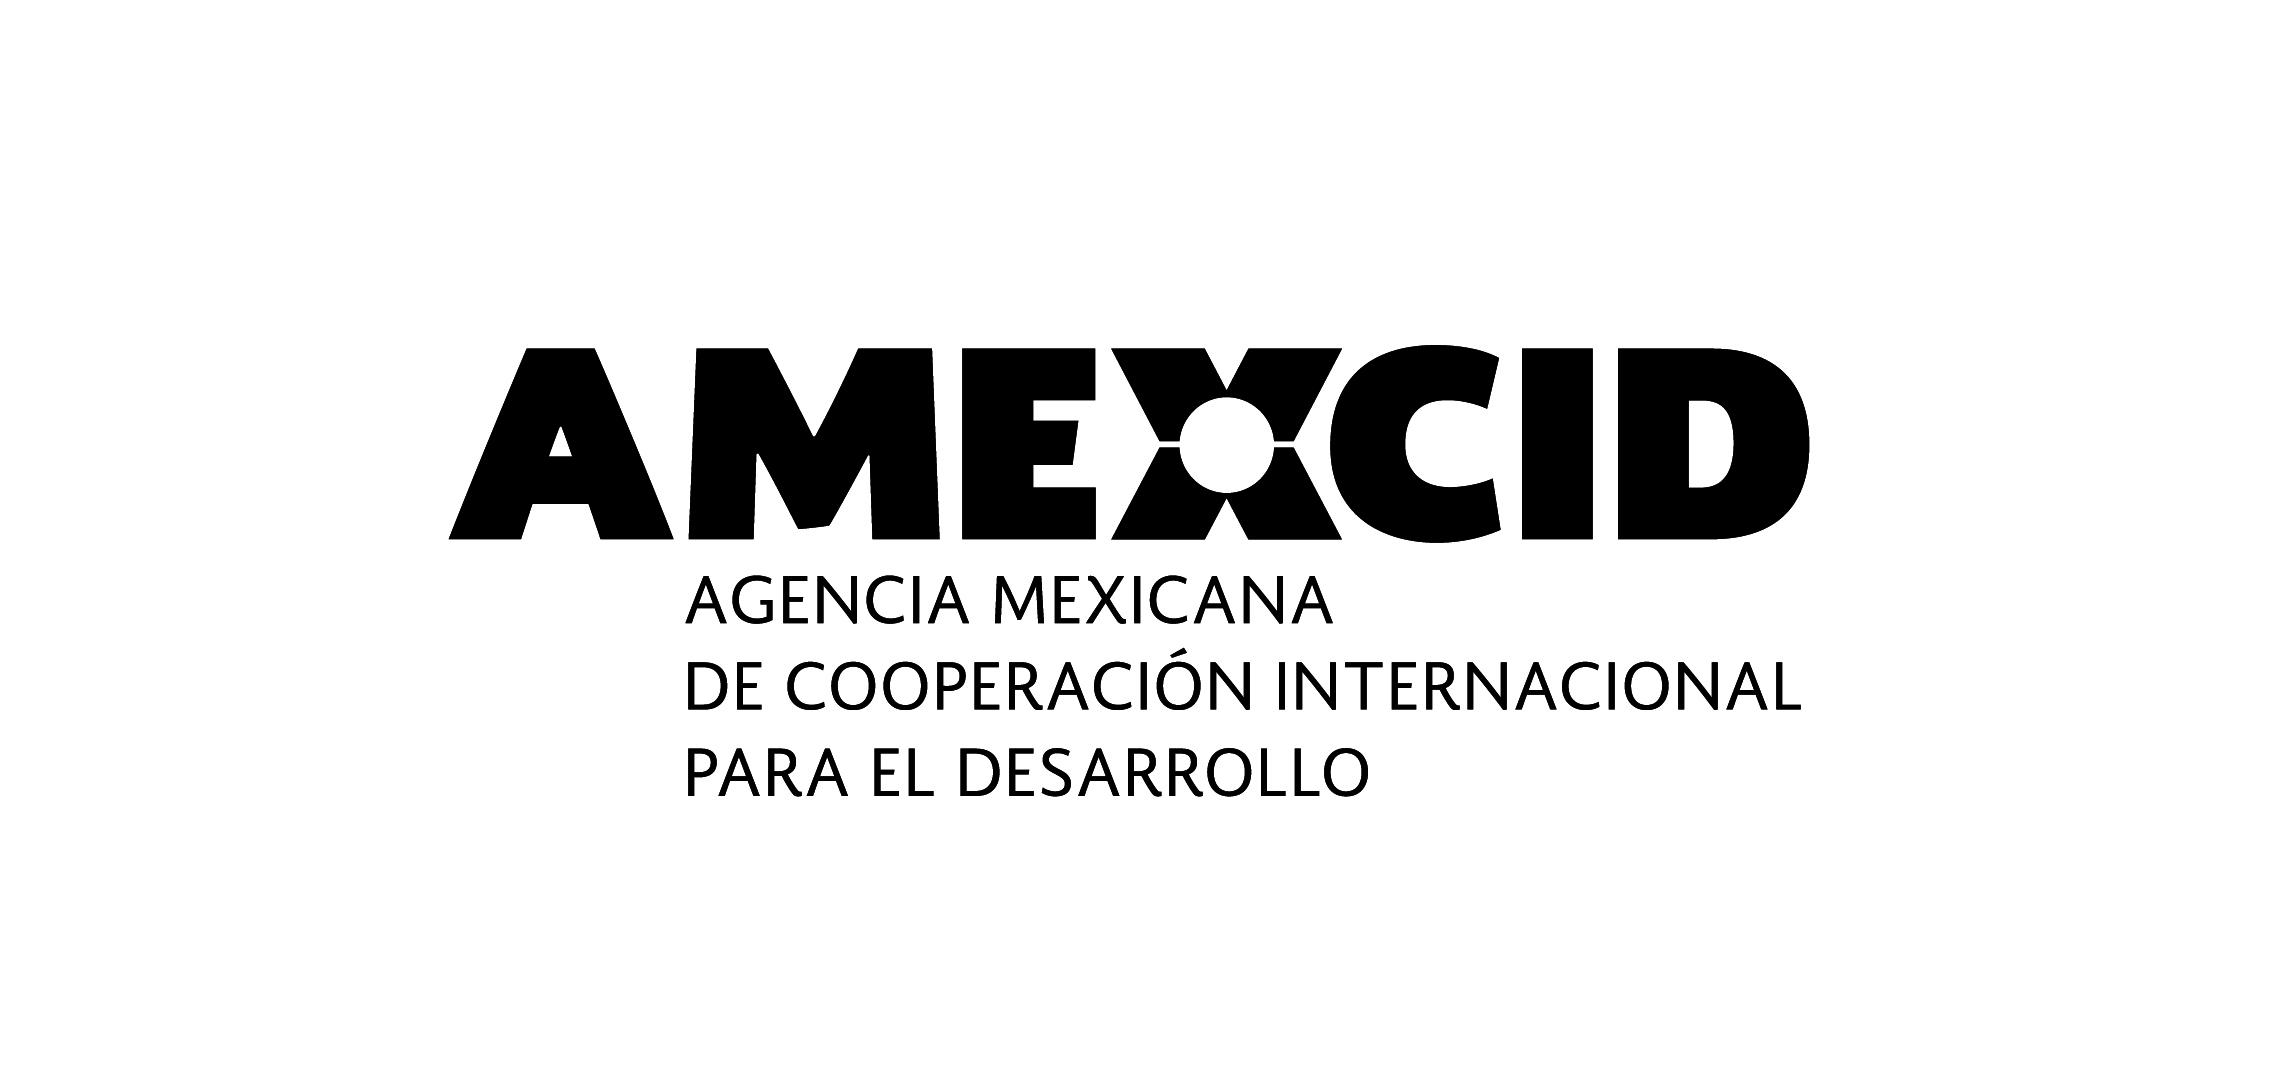 amexcid_vector_bn-02